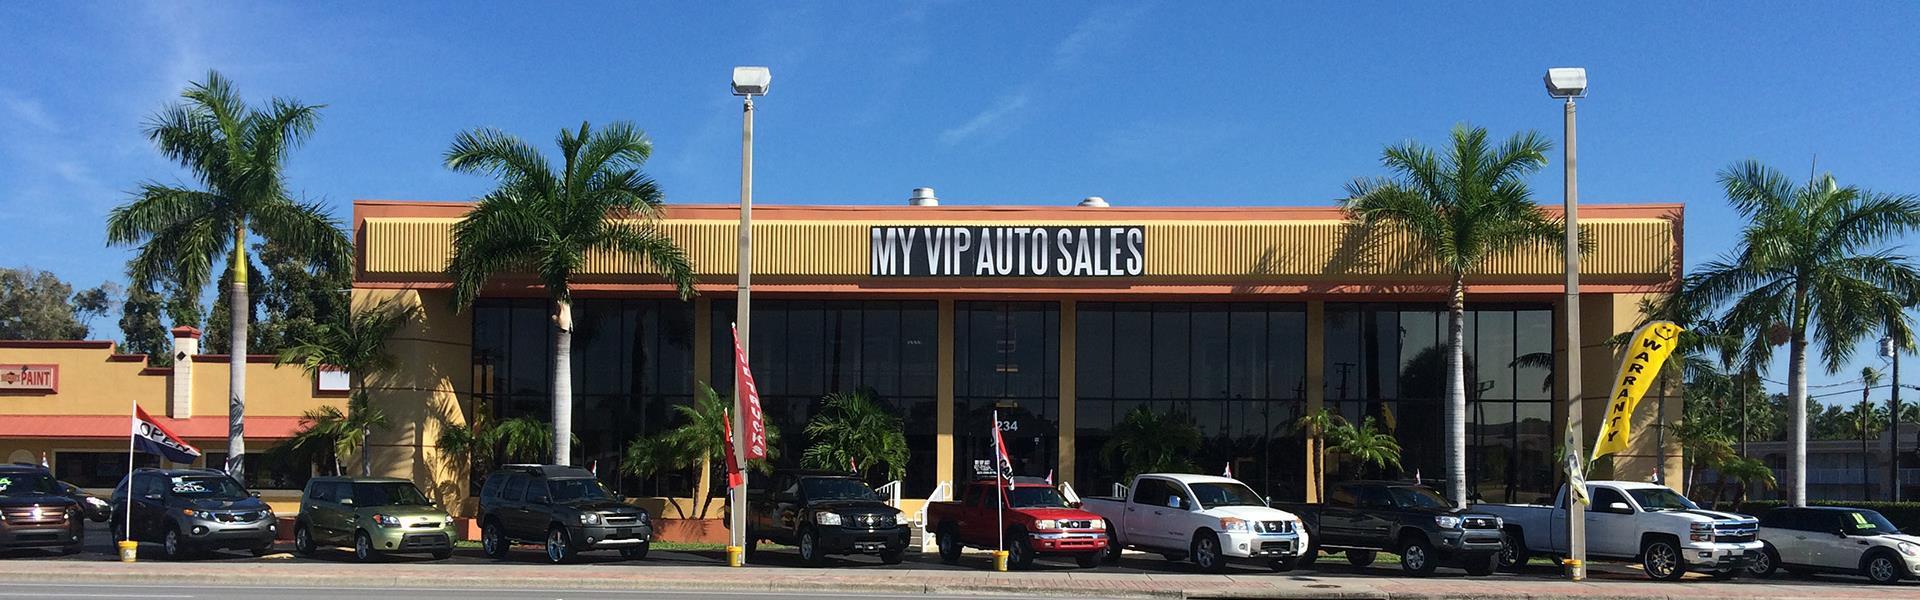 Vip Auto Sales >> Used Cars Merritt Island Fl Used Cars Trucks Fl My Vip